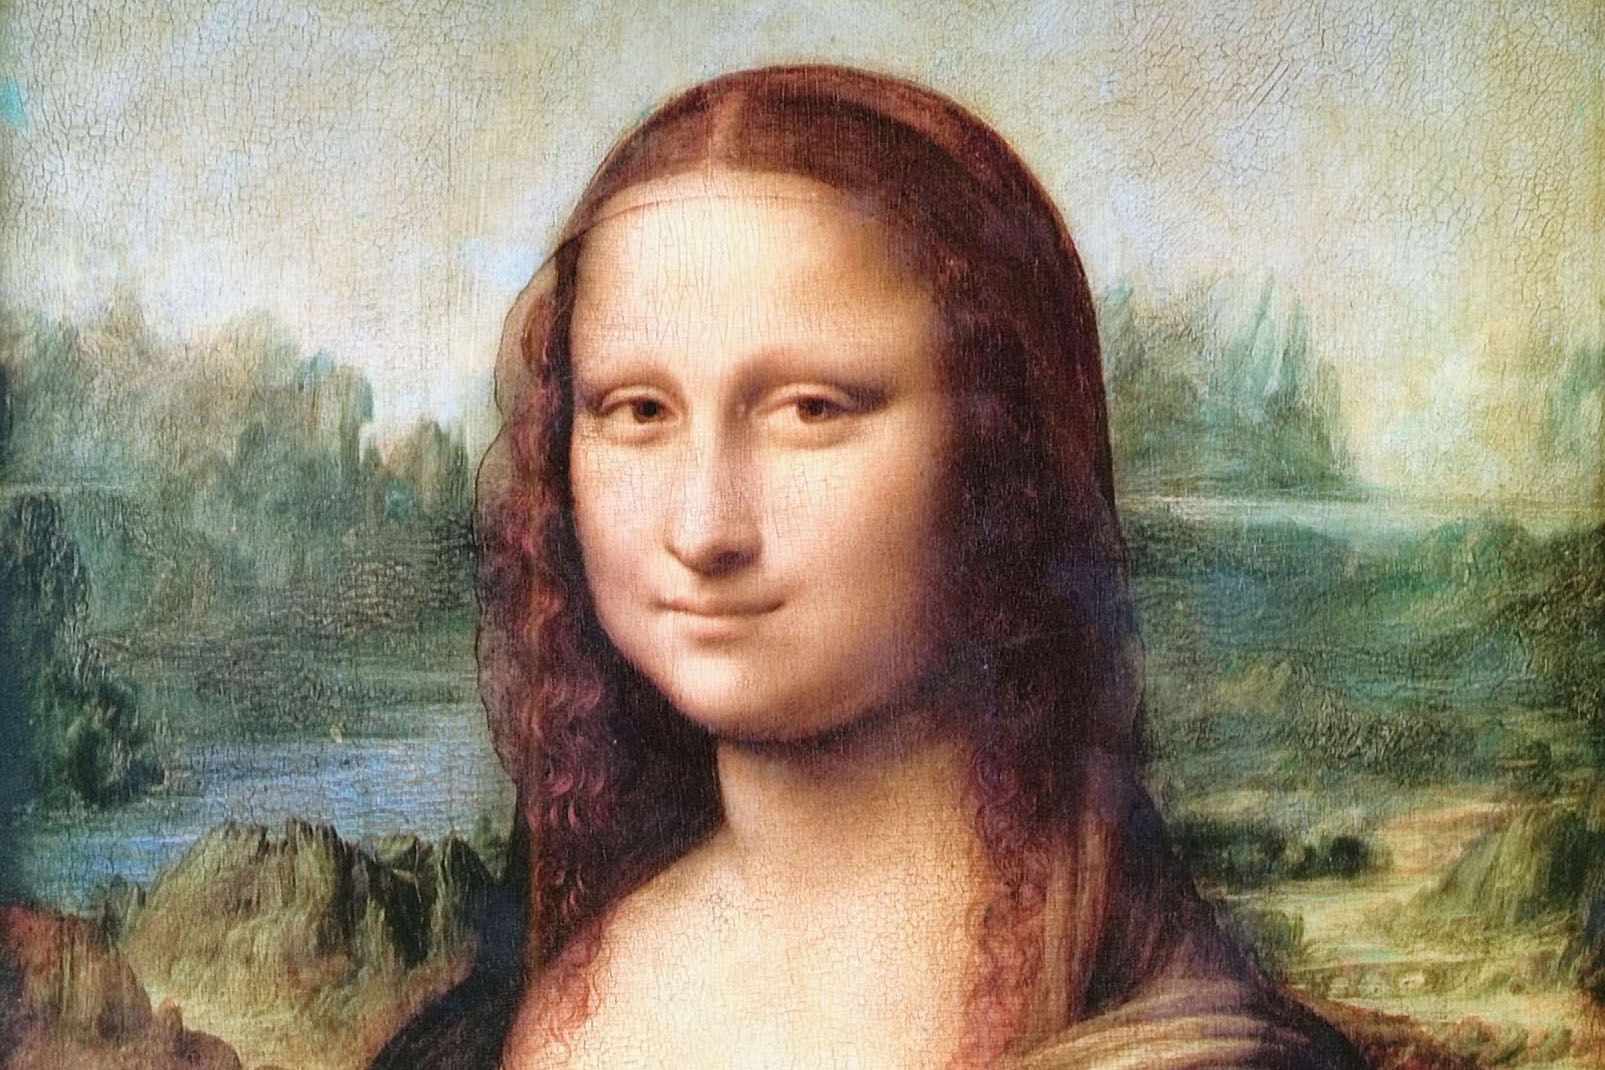 Ile-de-France, Paris, France, Europe, louvre, musée, joconde, tableau, de vinci, art